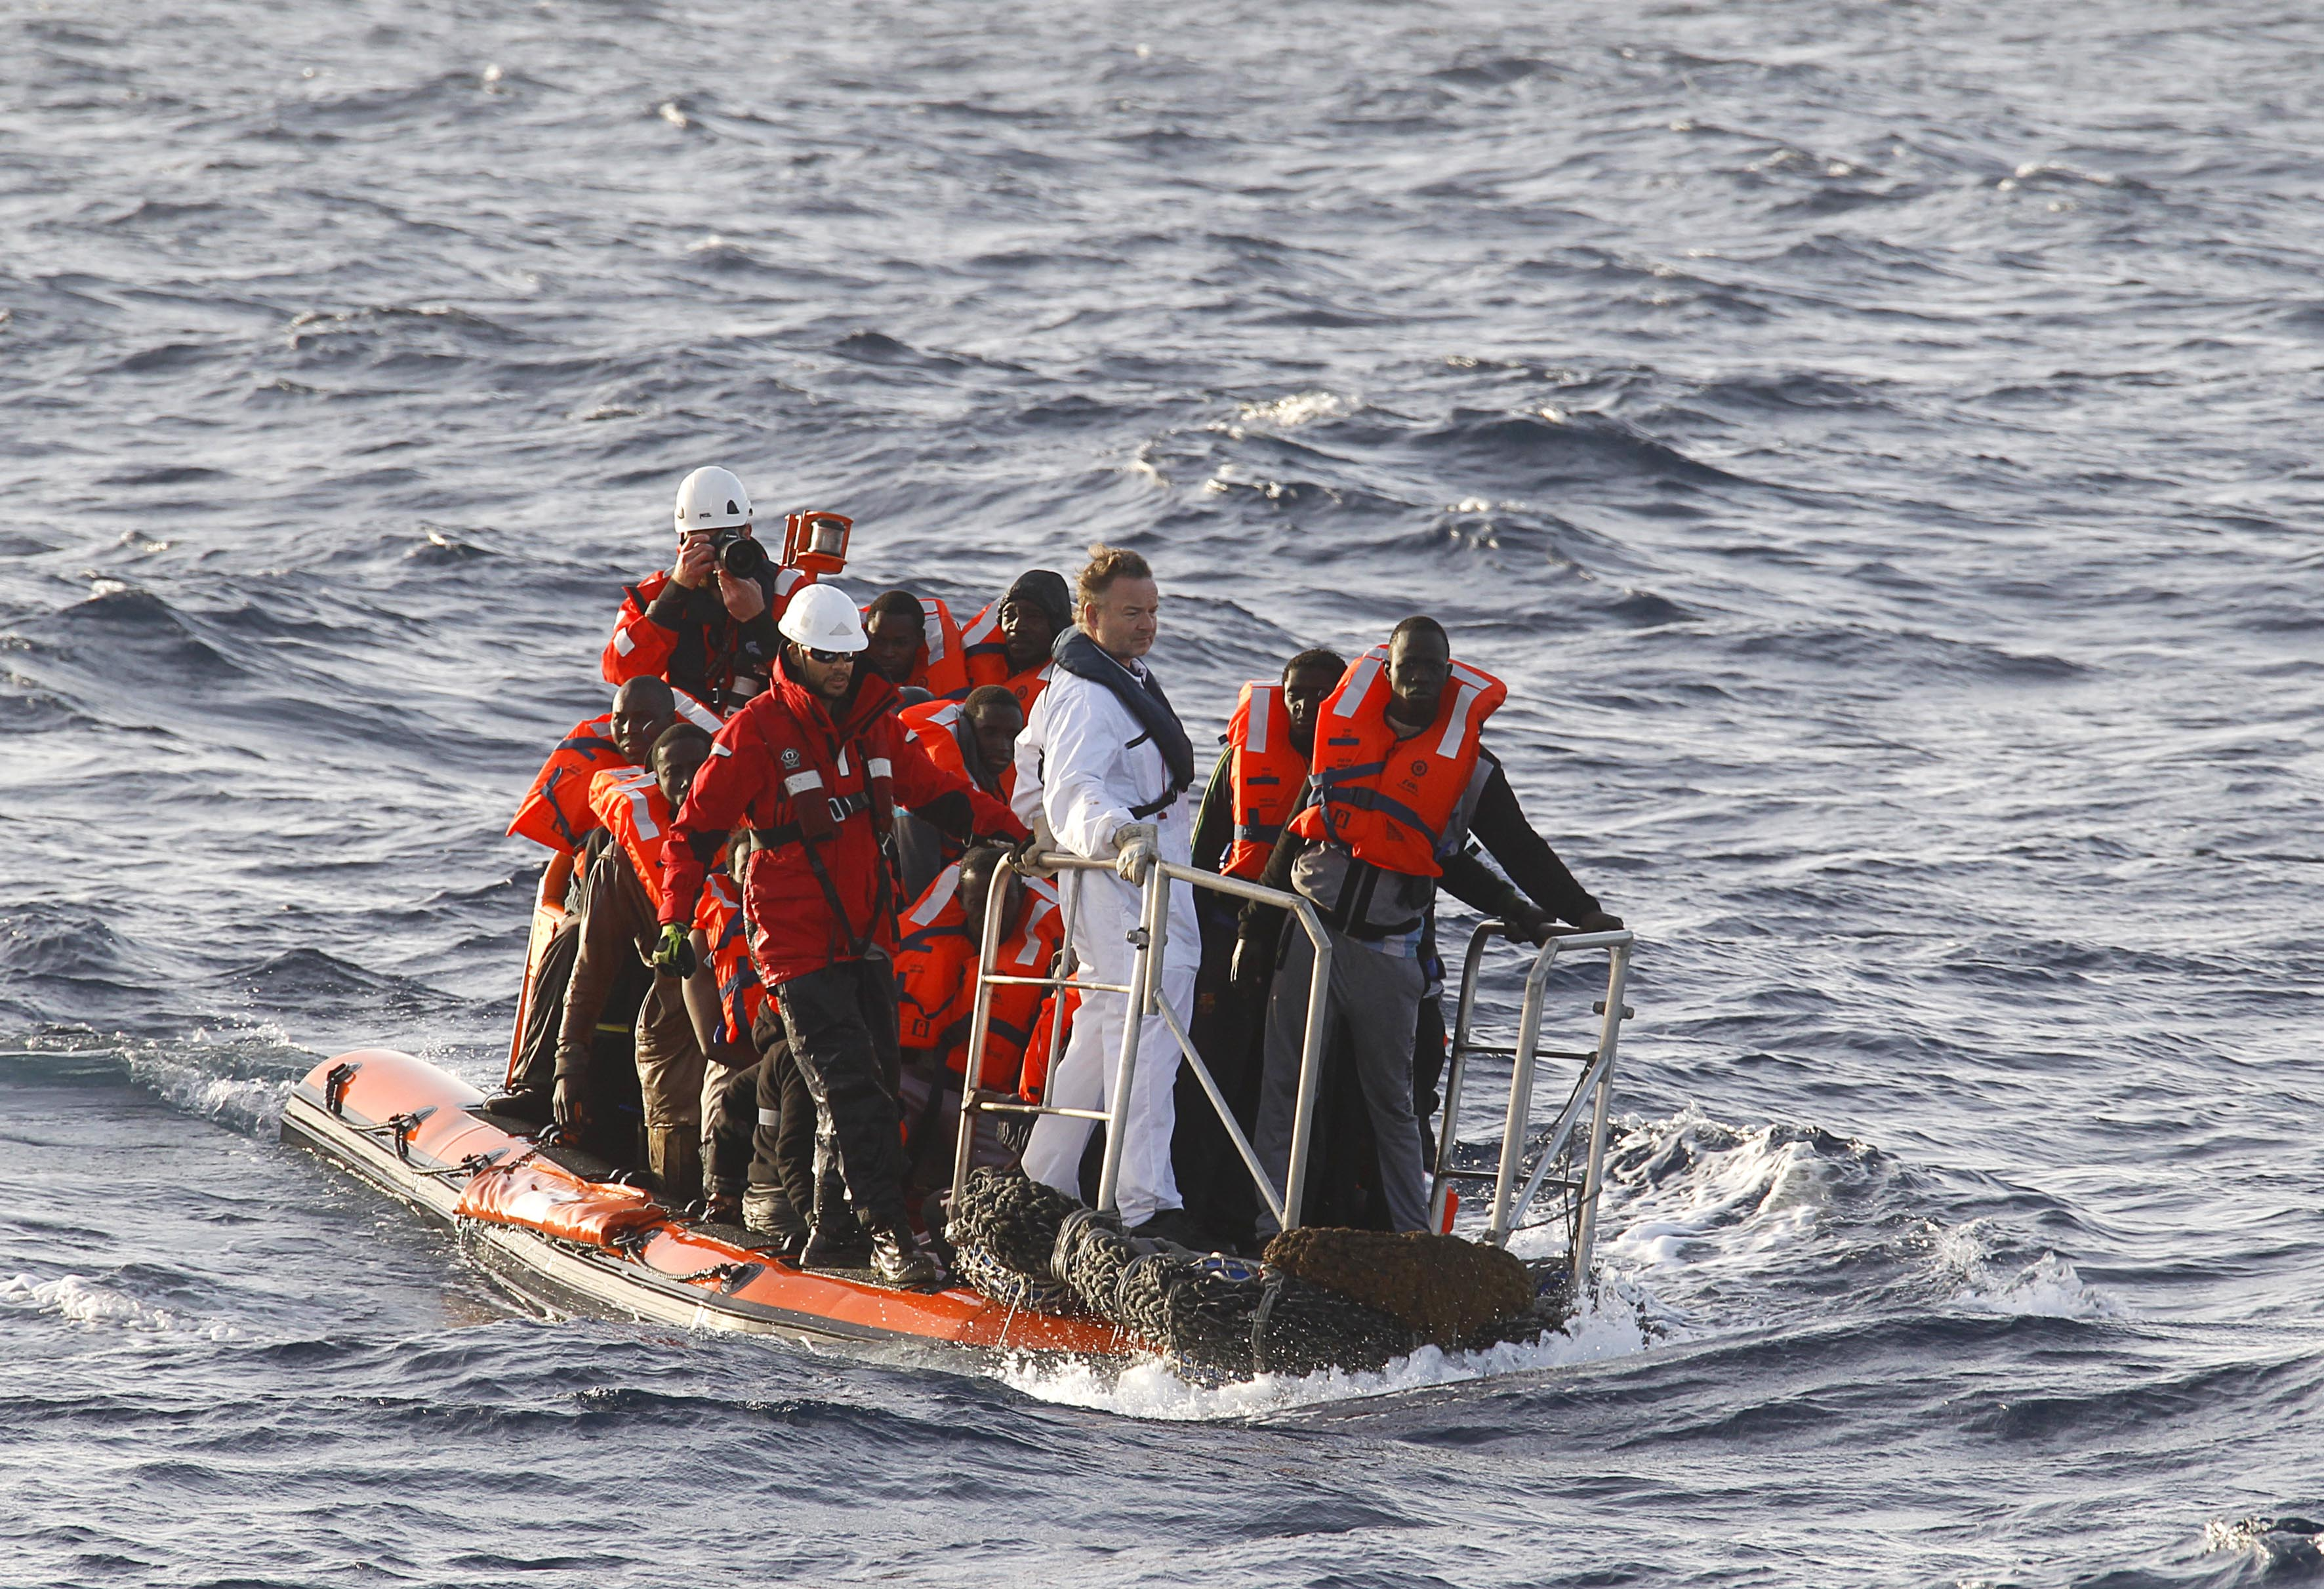 Seenotrettung Mittelmeer Spenden